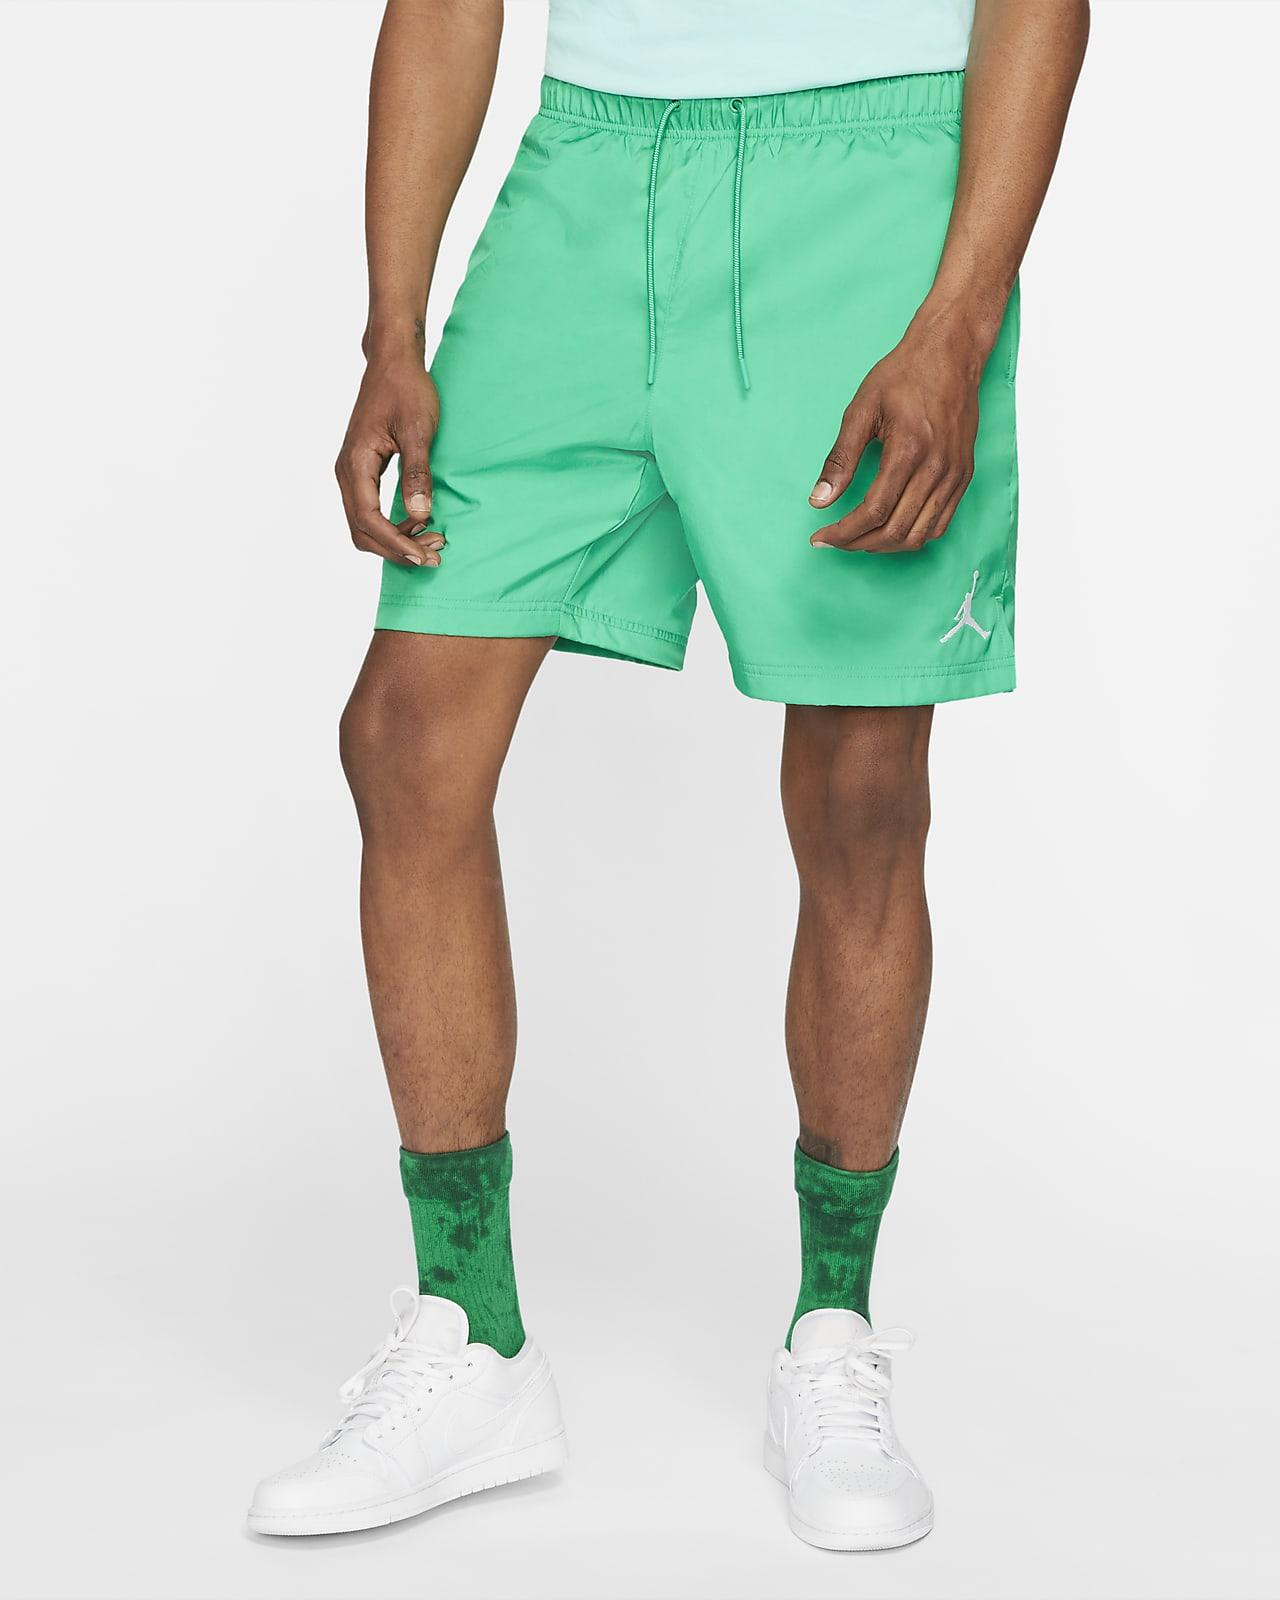 Jordan Jumpman Men's Poolside Shorts